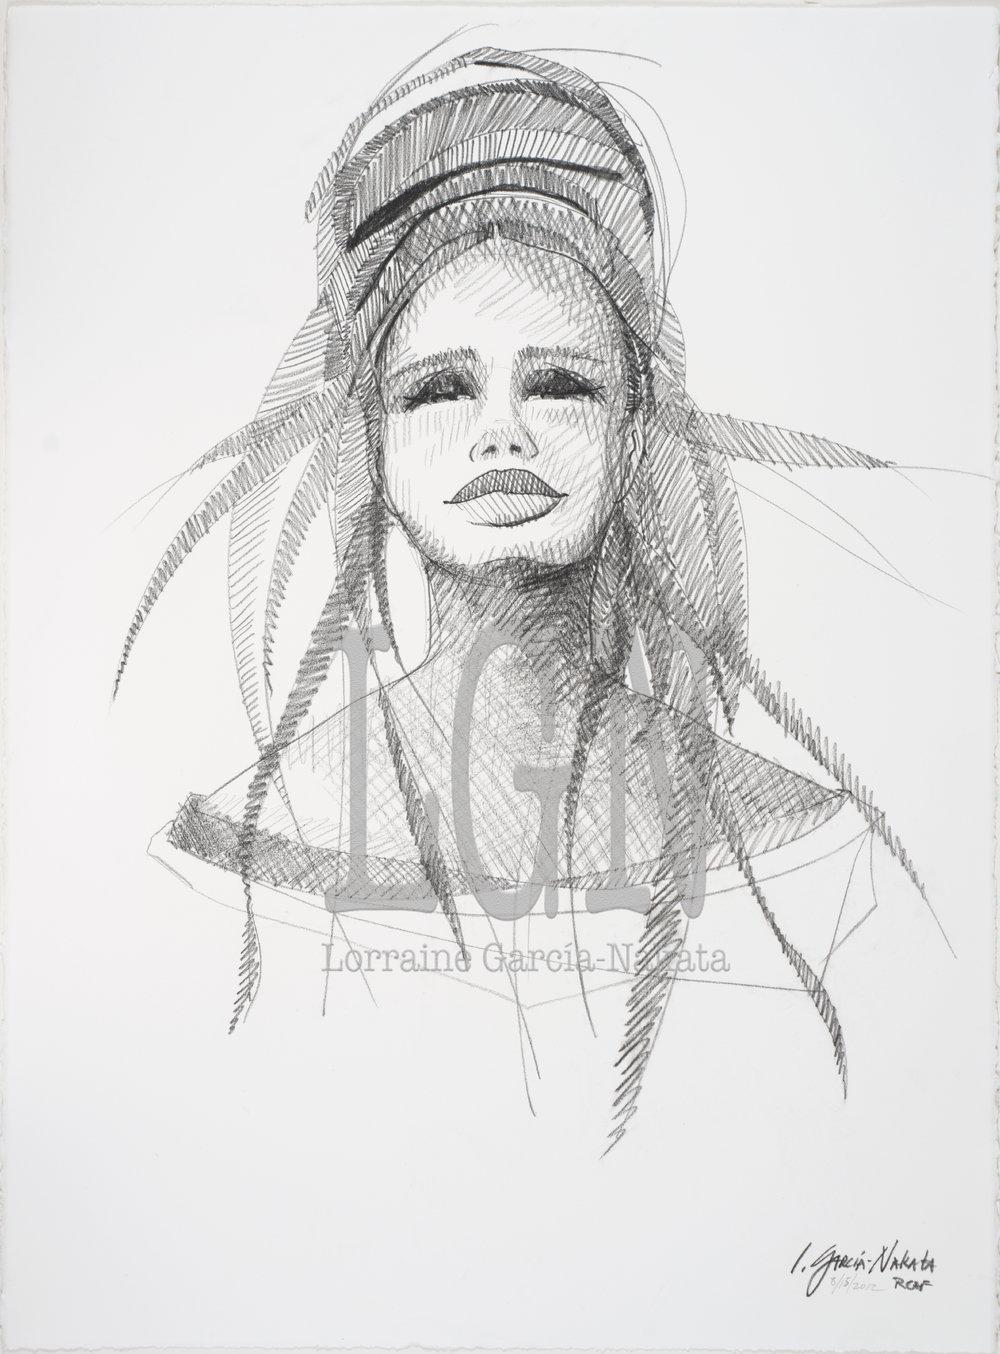 new LGN_drawing-0112.jpg